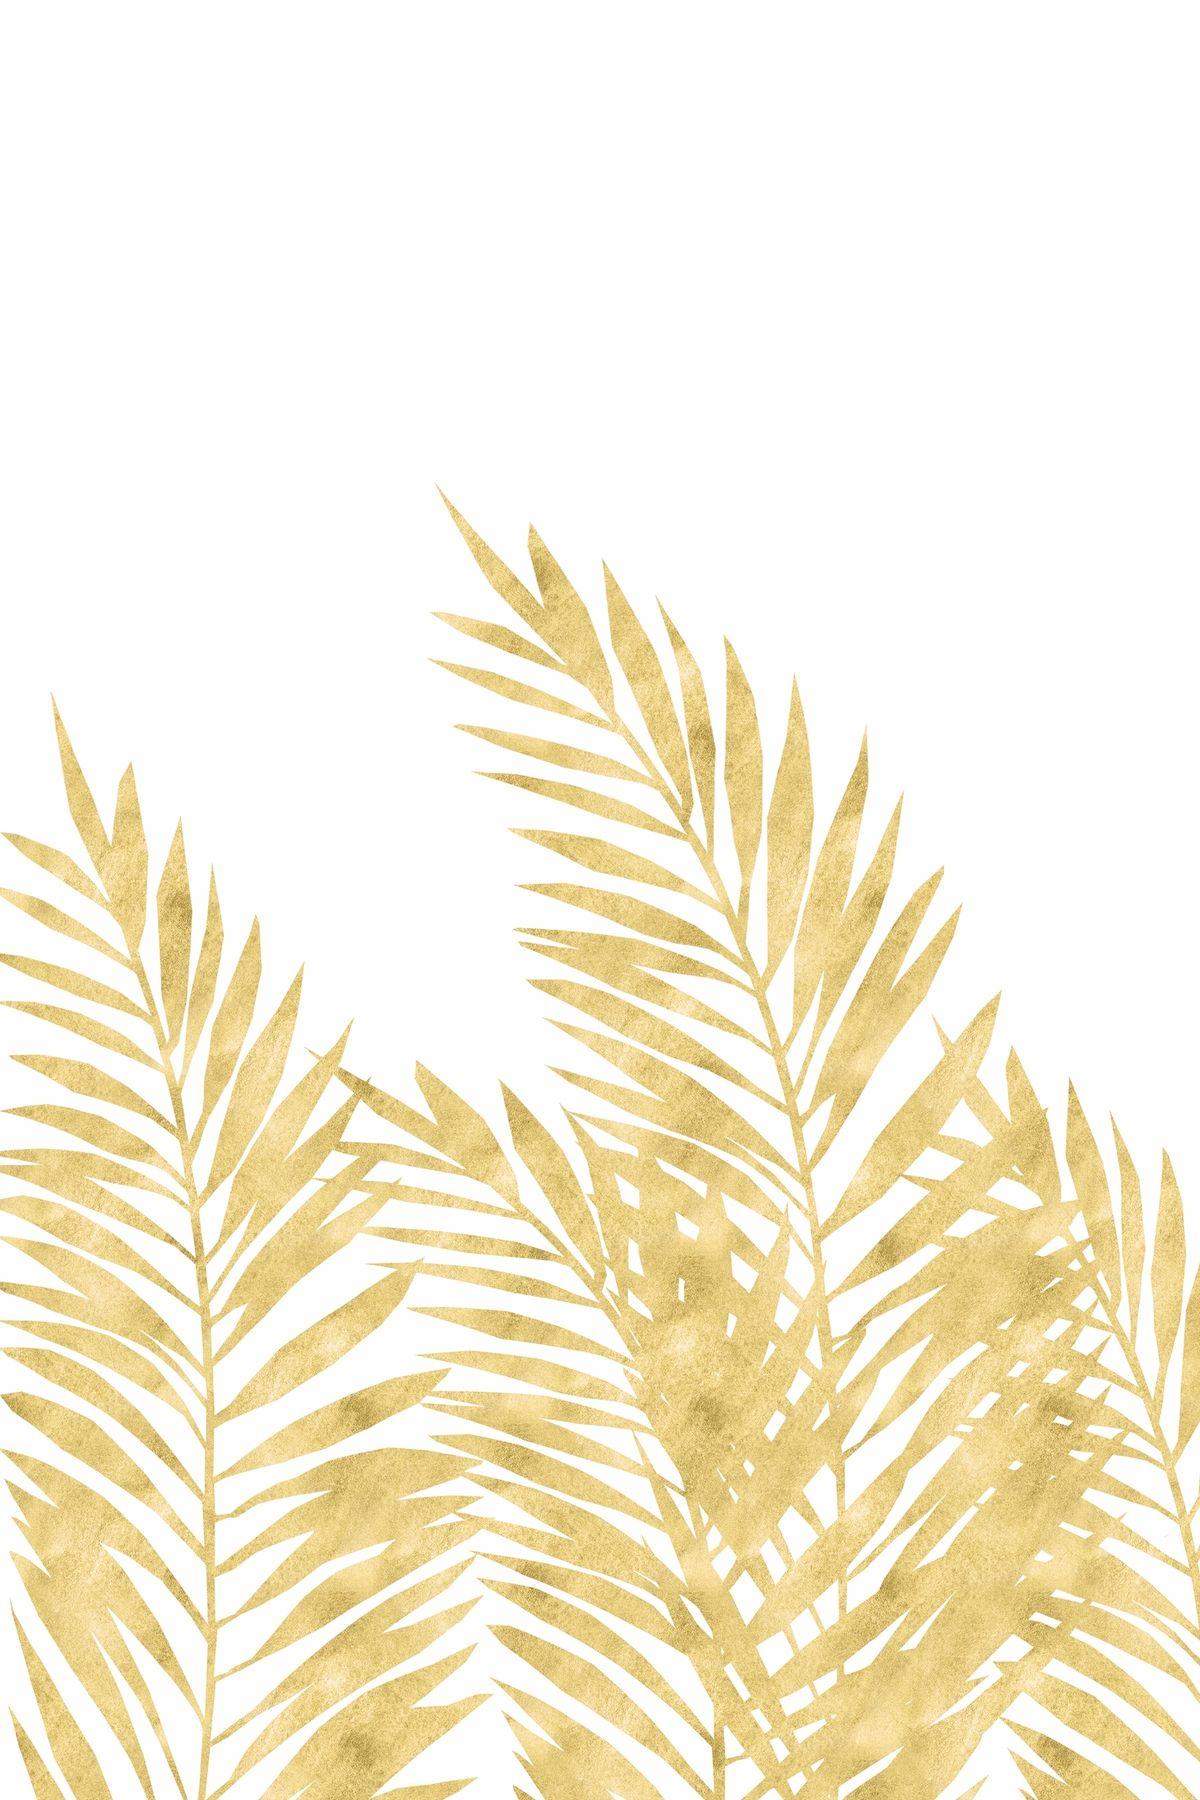 Palm Leaves Golden Wallpaper Golden Wallpaper Palm Leaf Wallpaper Golden Wall